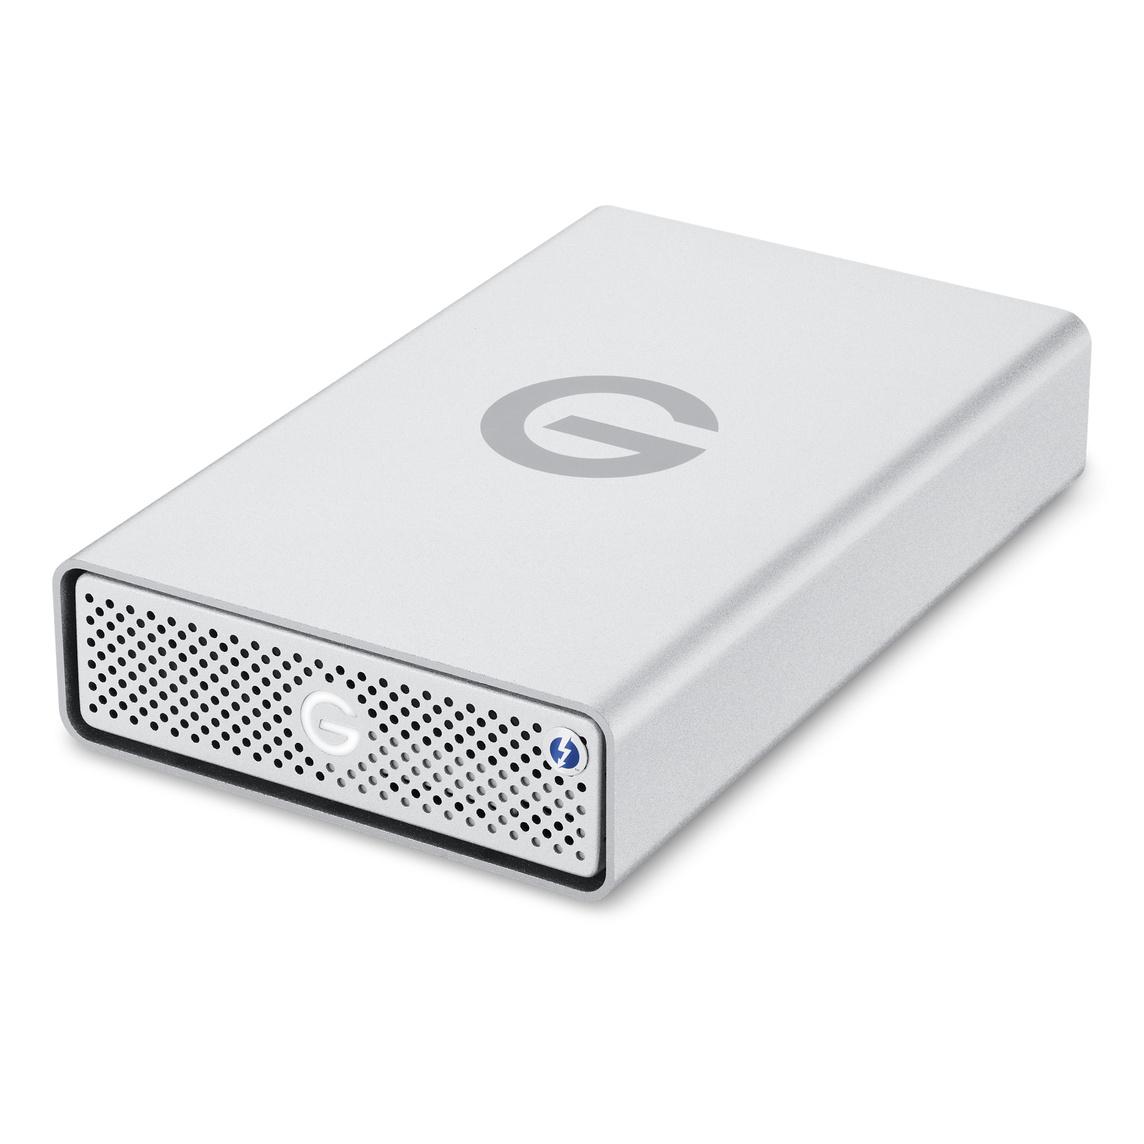 G-Technology 10TB G-DRIVE with Thunderbolt 3 Hard Drive - Apple (SG)